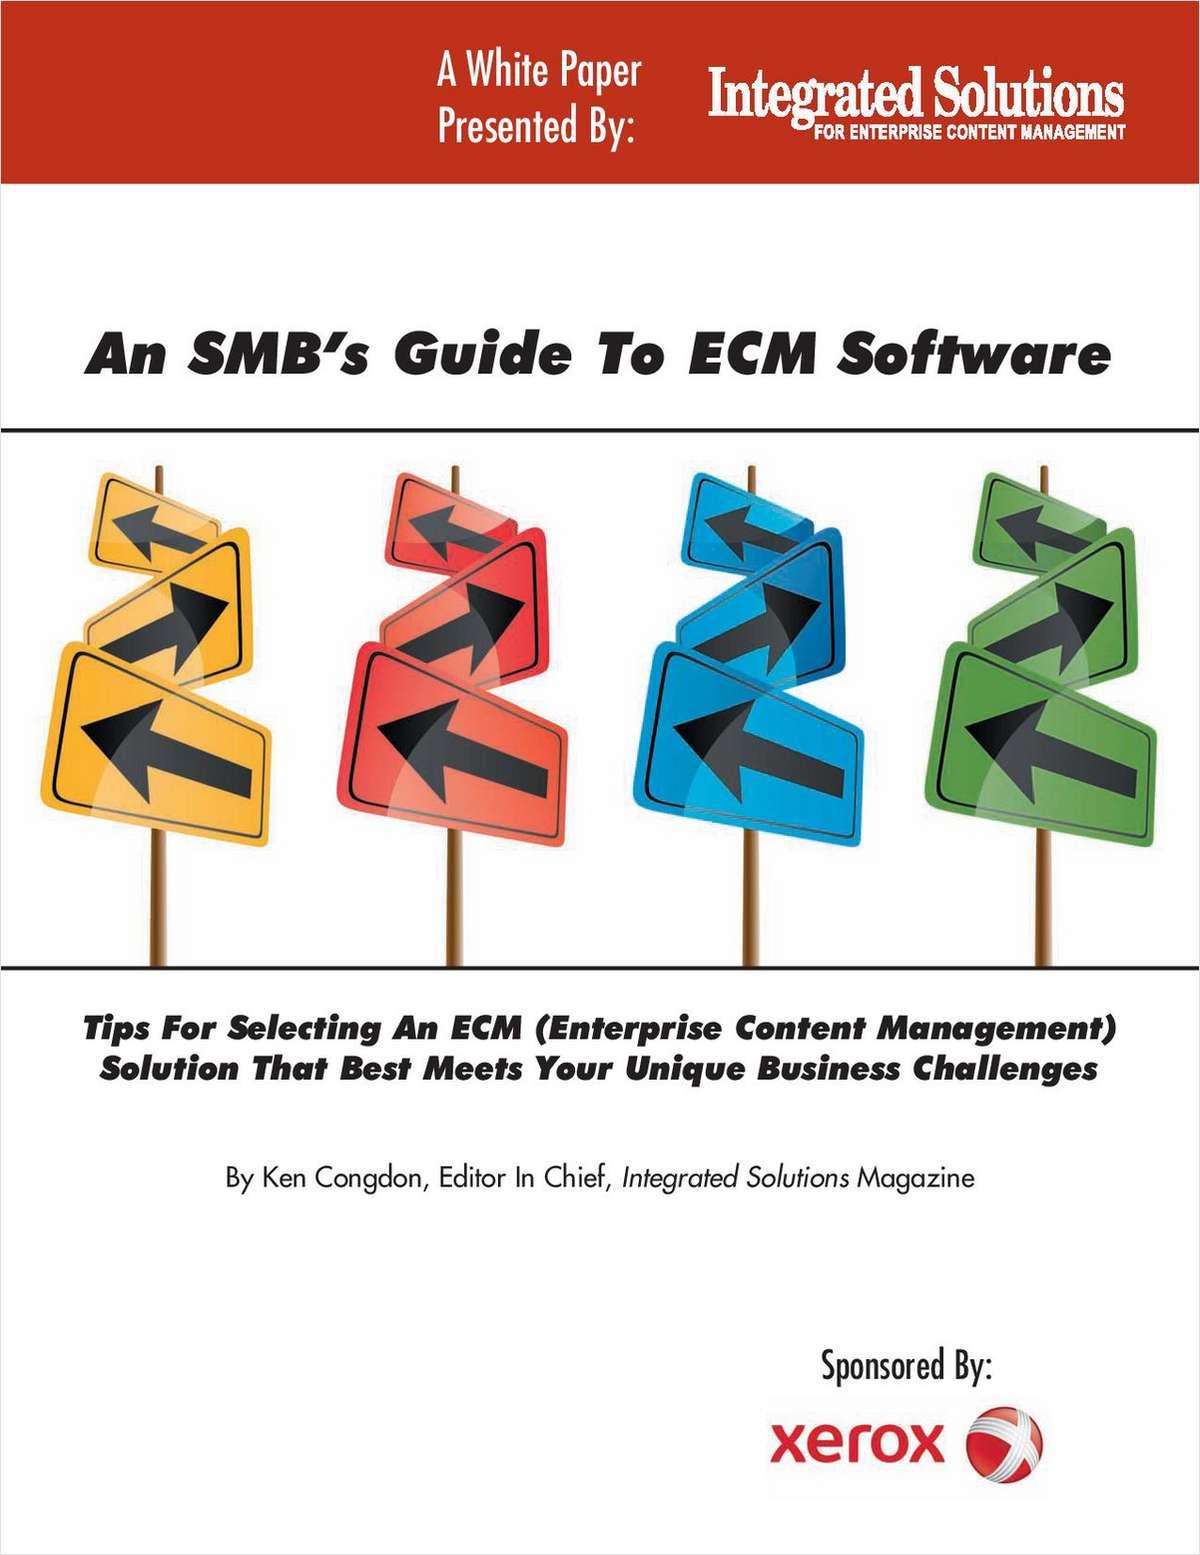 An SMB's Guide to ECM Software